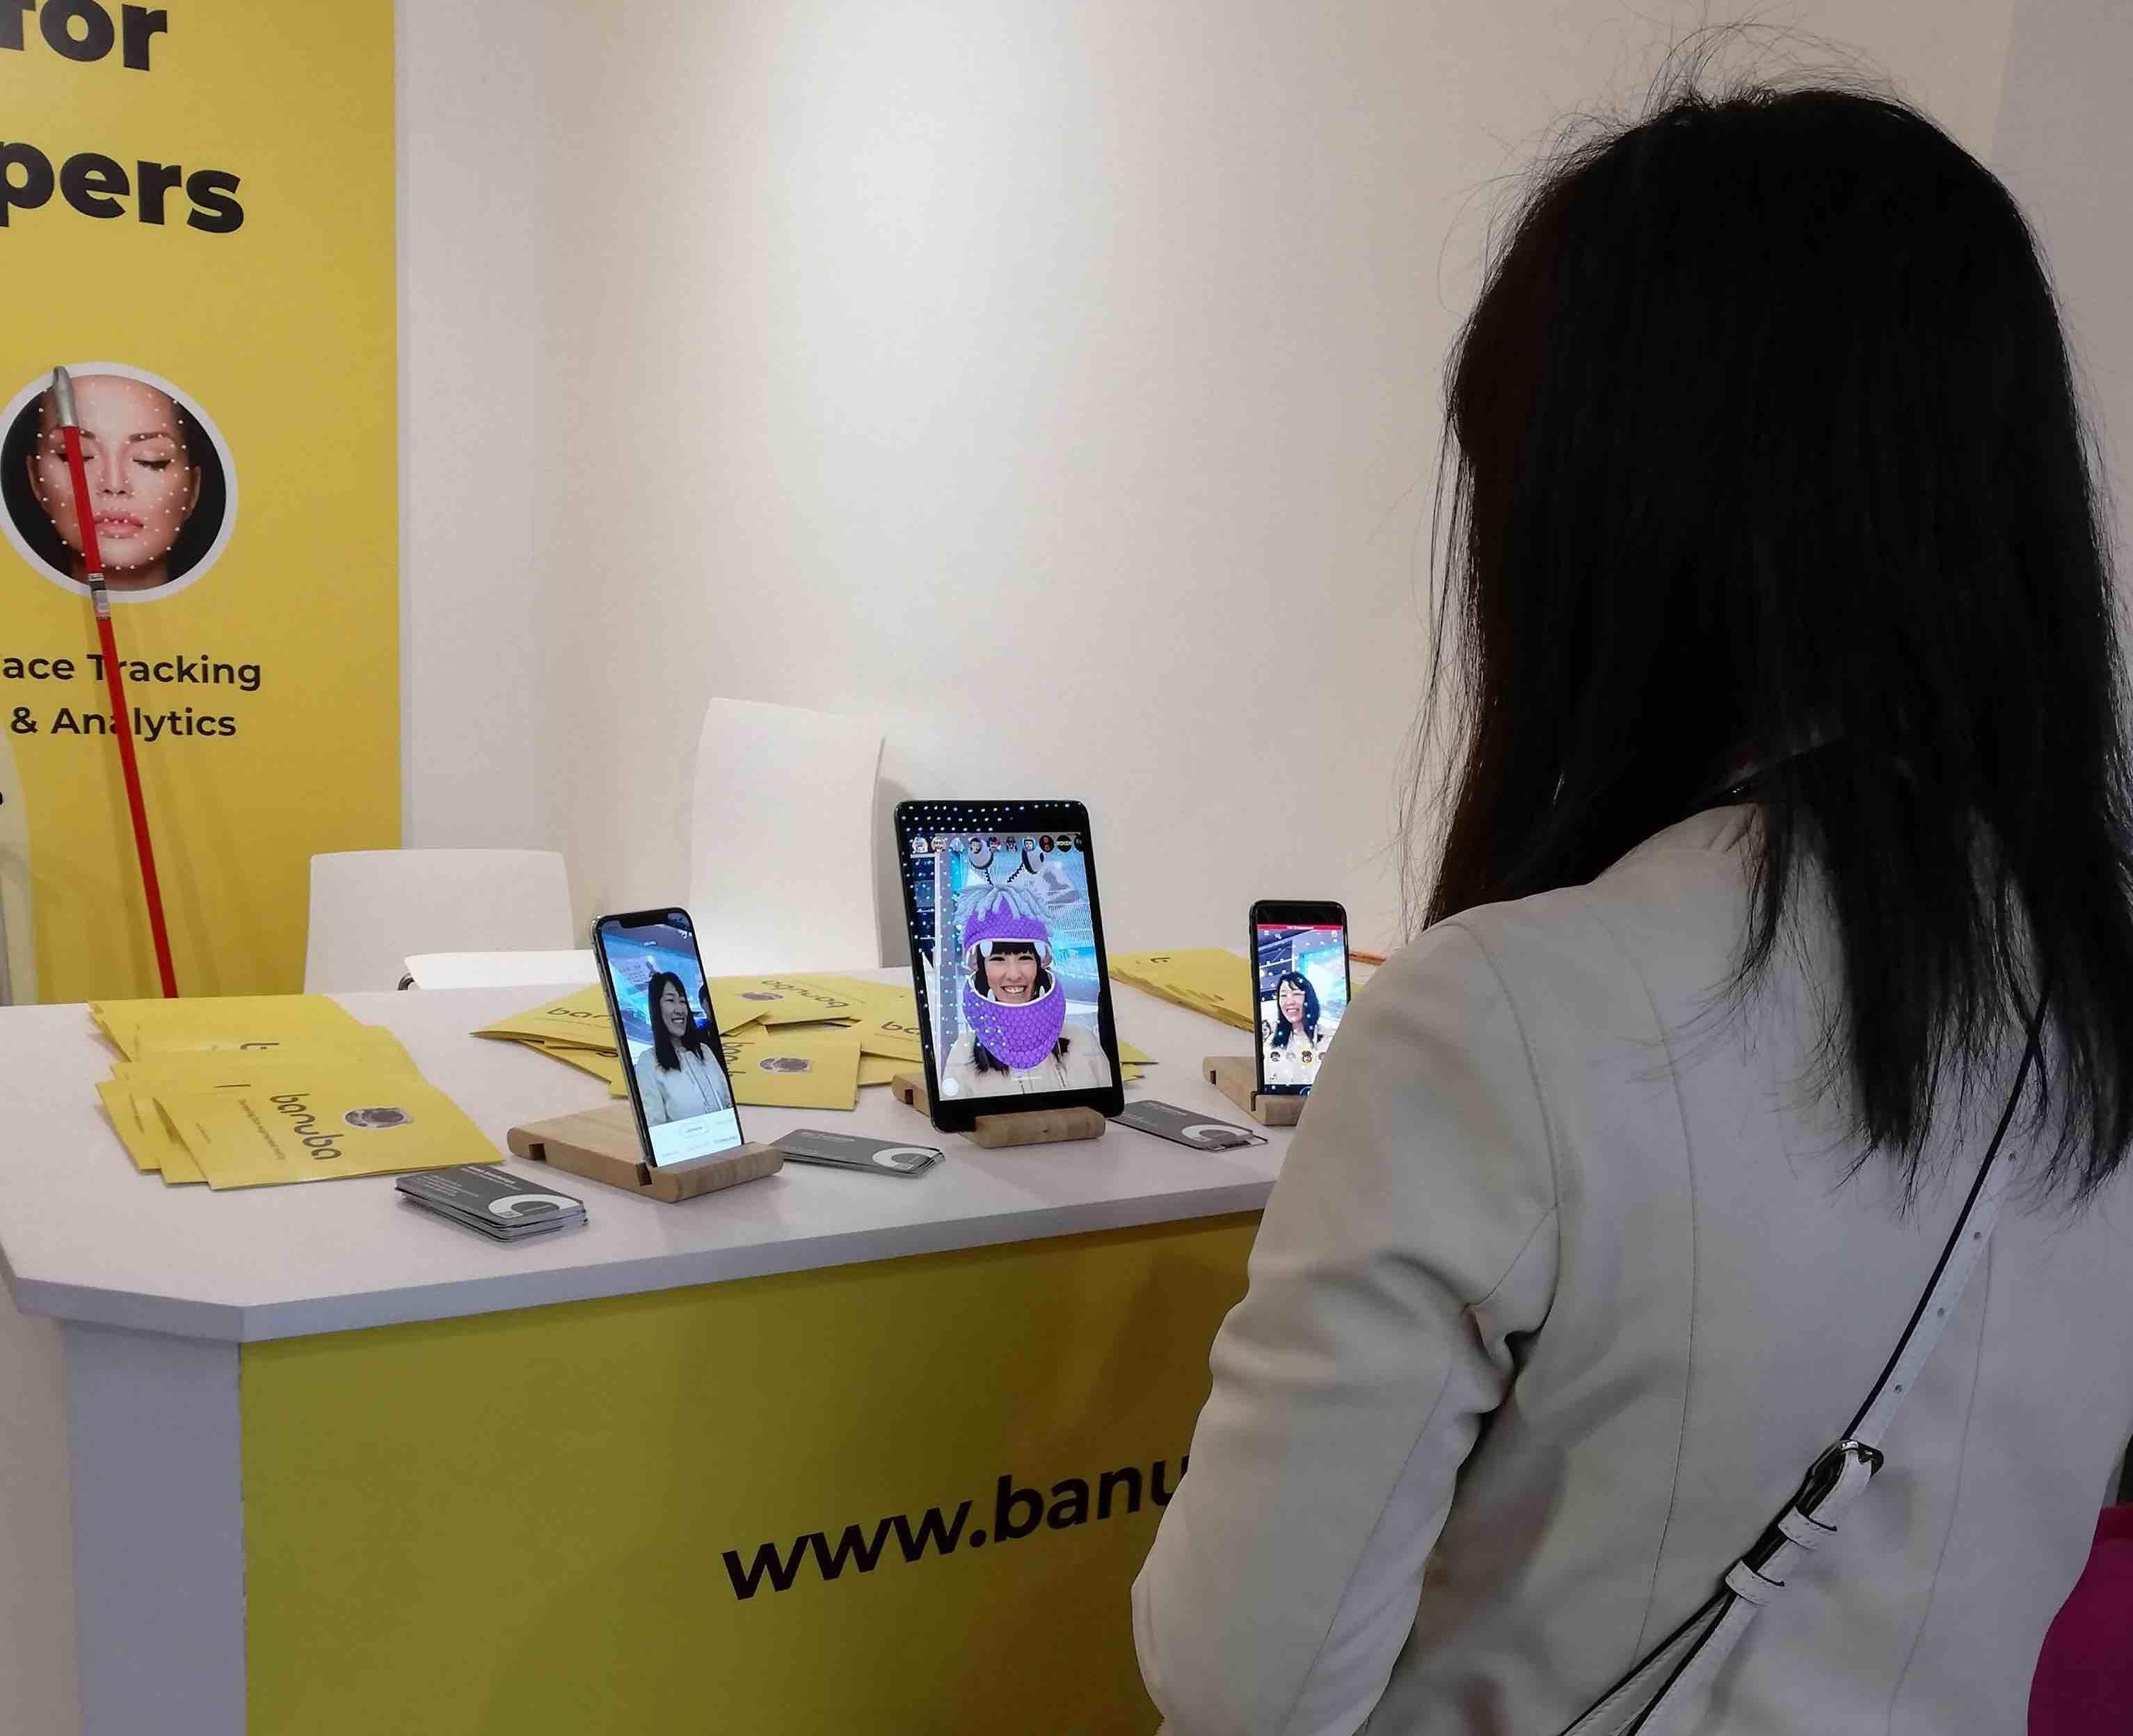 Banuba mobile world congress users